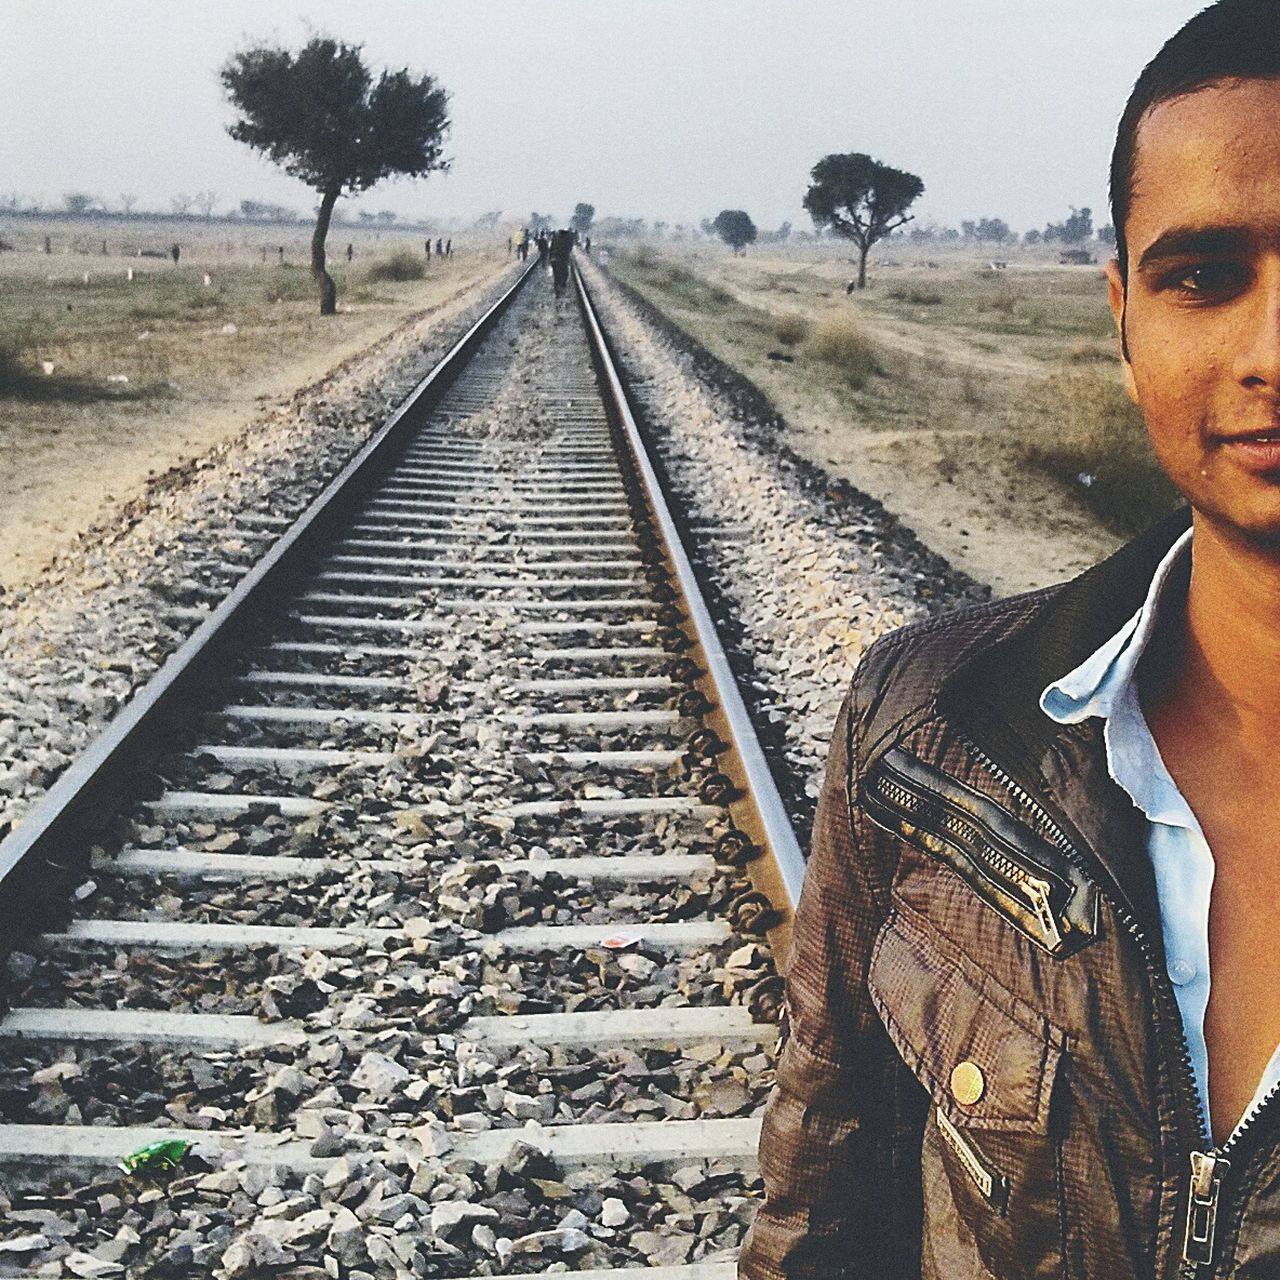 Boys at tracks...!! fahad with ahad Sakal Raggistan Desert Model Rajasthan Simple Awsome Street Fashion The Potraitist - 2015 EyeEm Awards Potrait Exploring New Ground